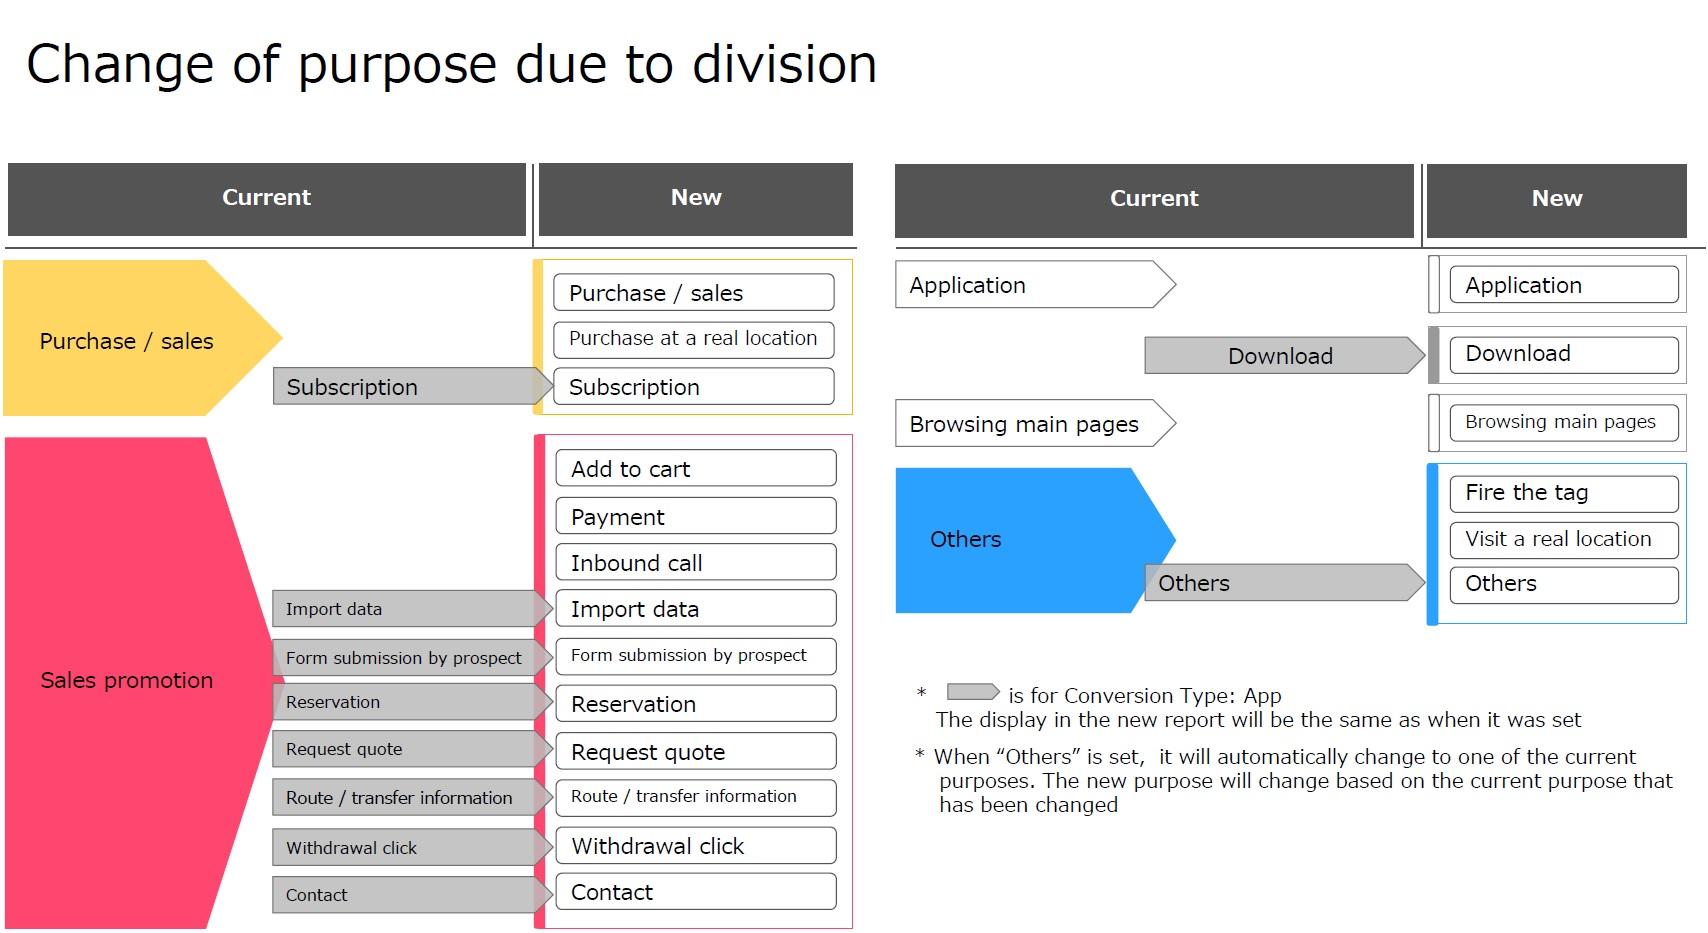 New conversion tracking purpose